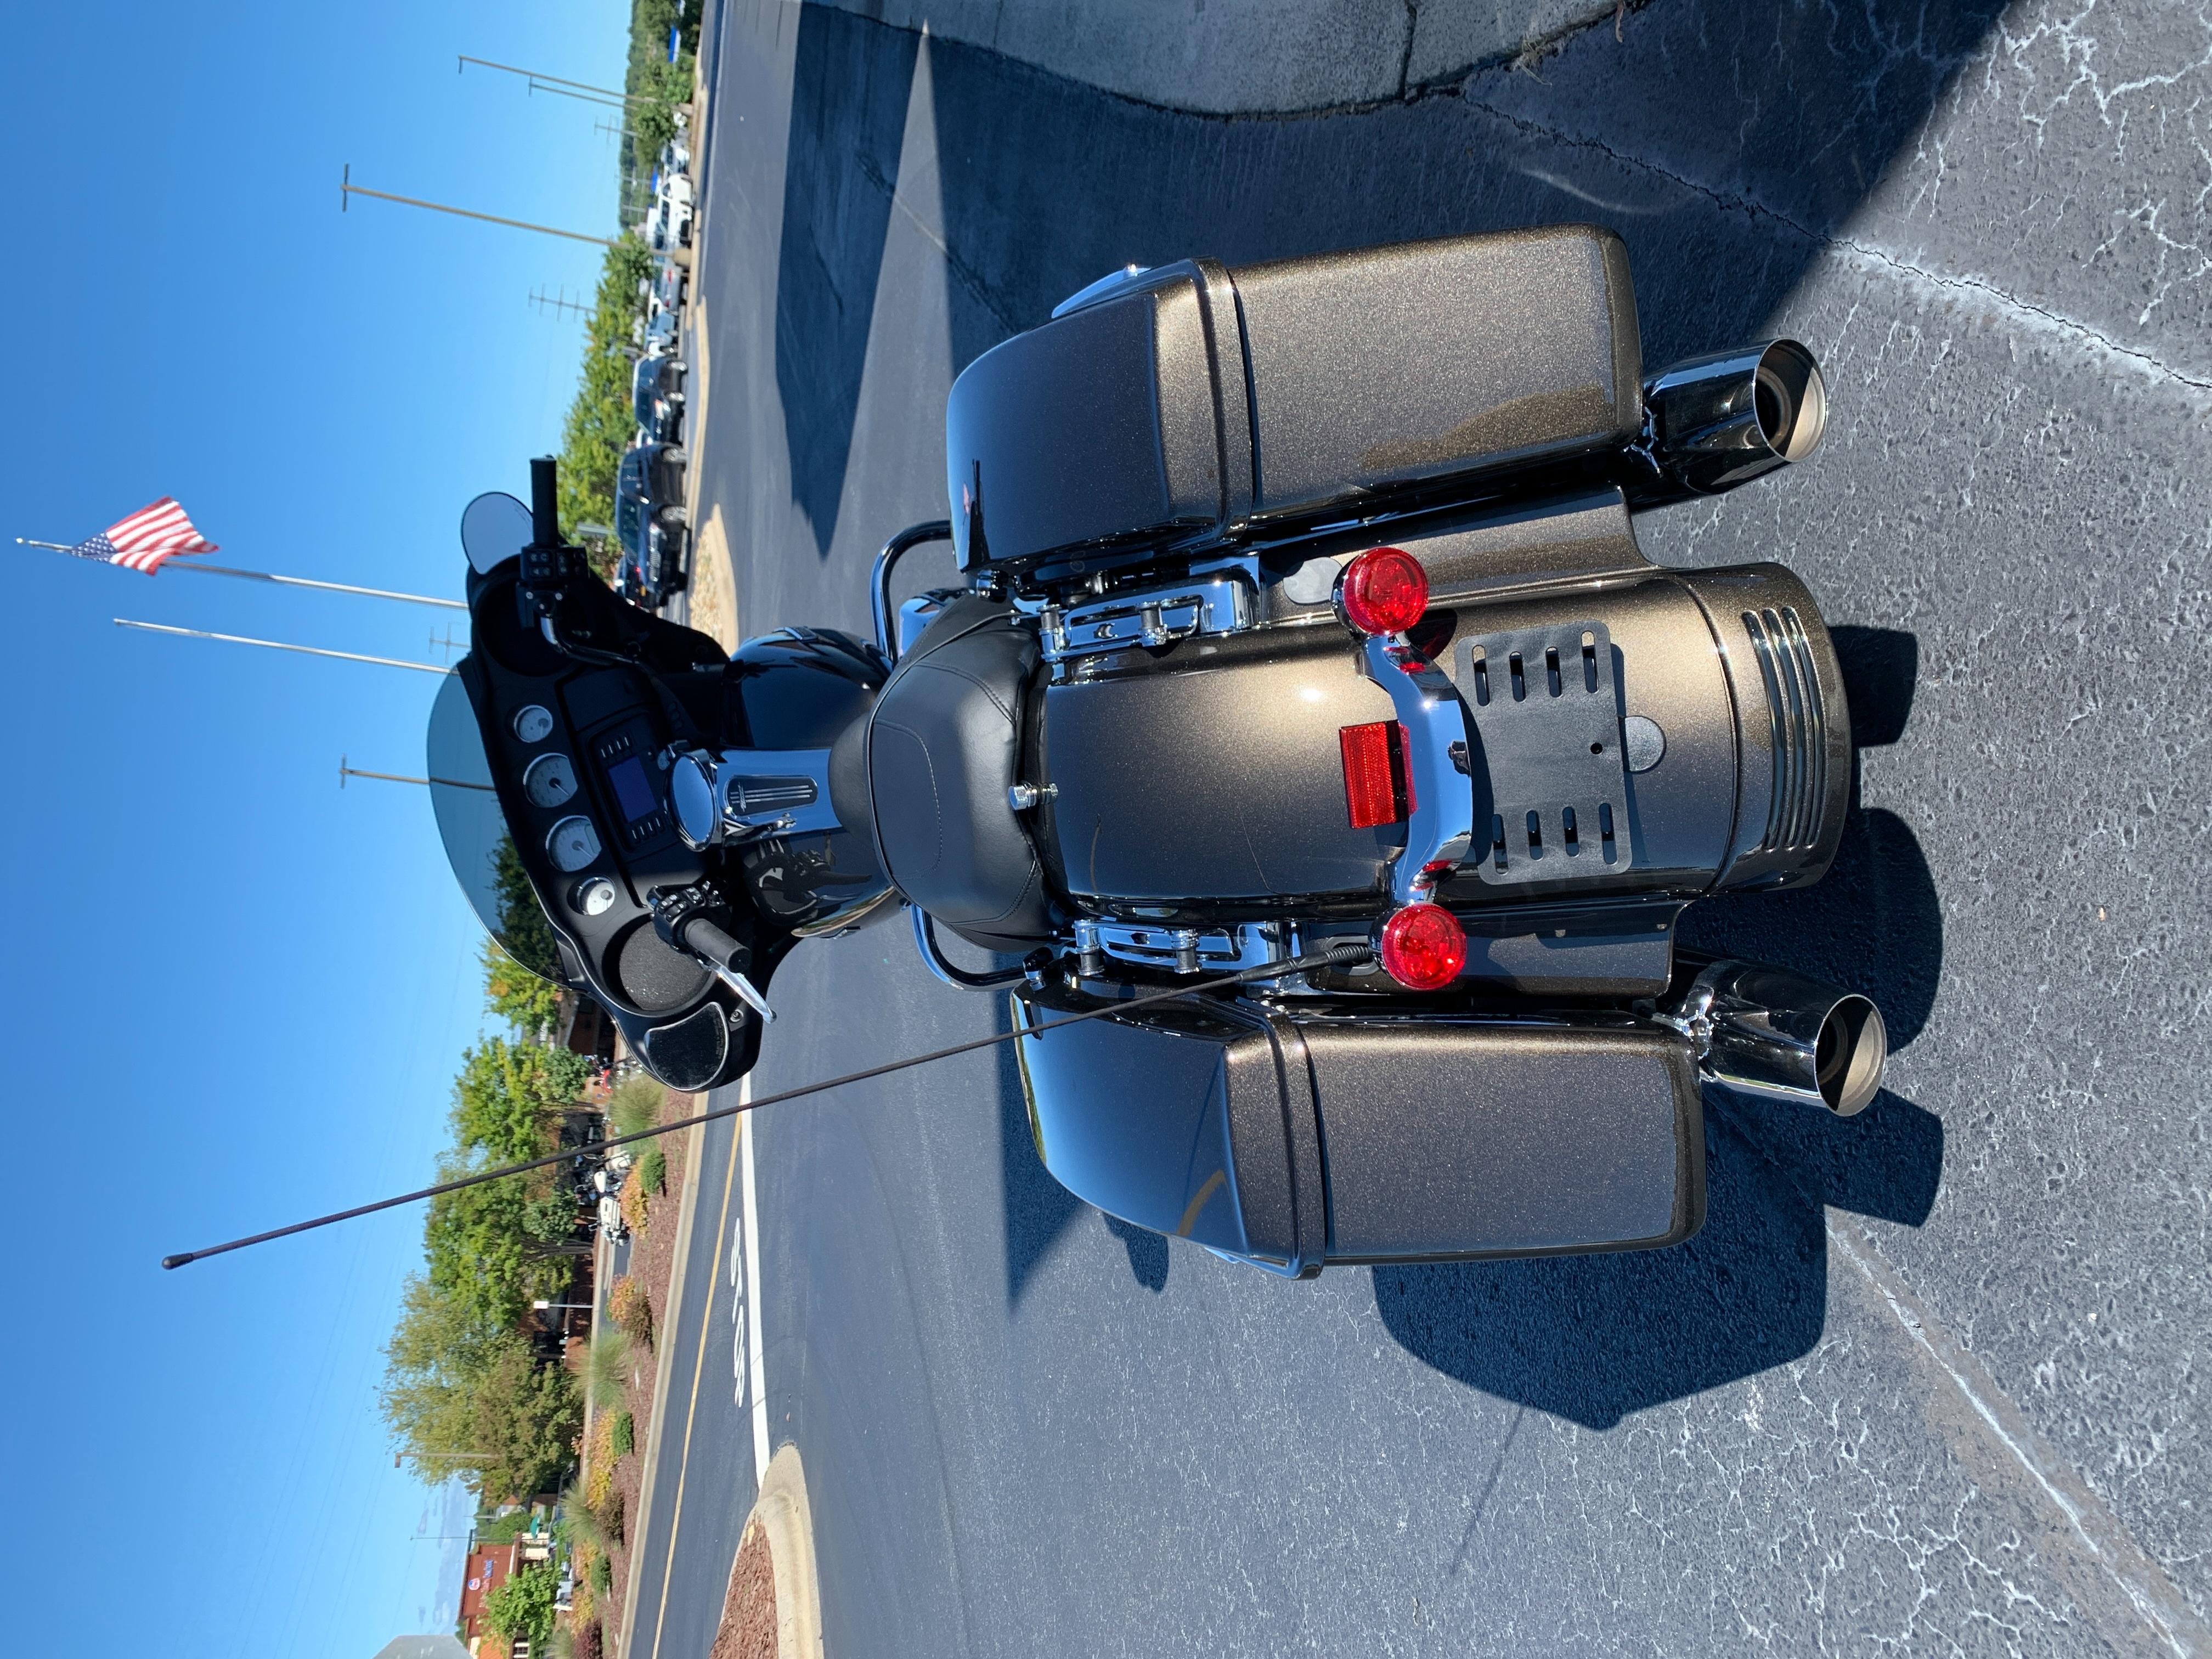 2021 Harley-Davidson Grand American Touring Street Glide at Speedway Harley-Davidson